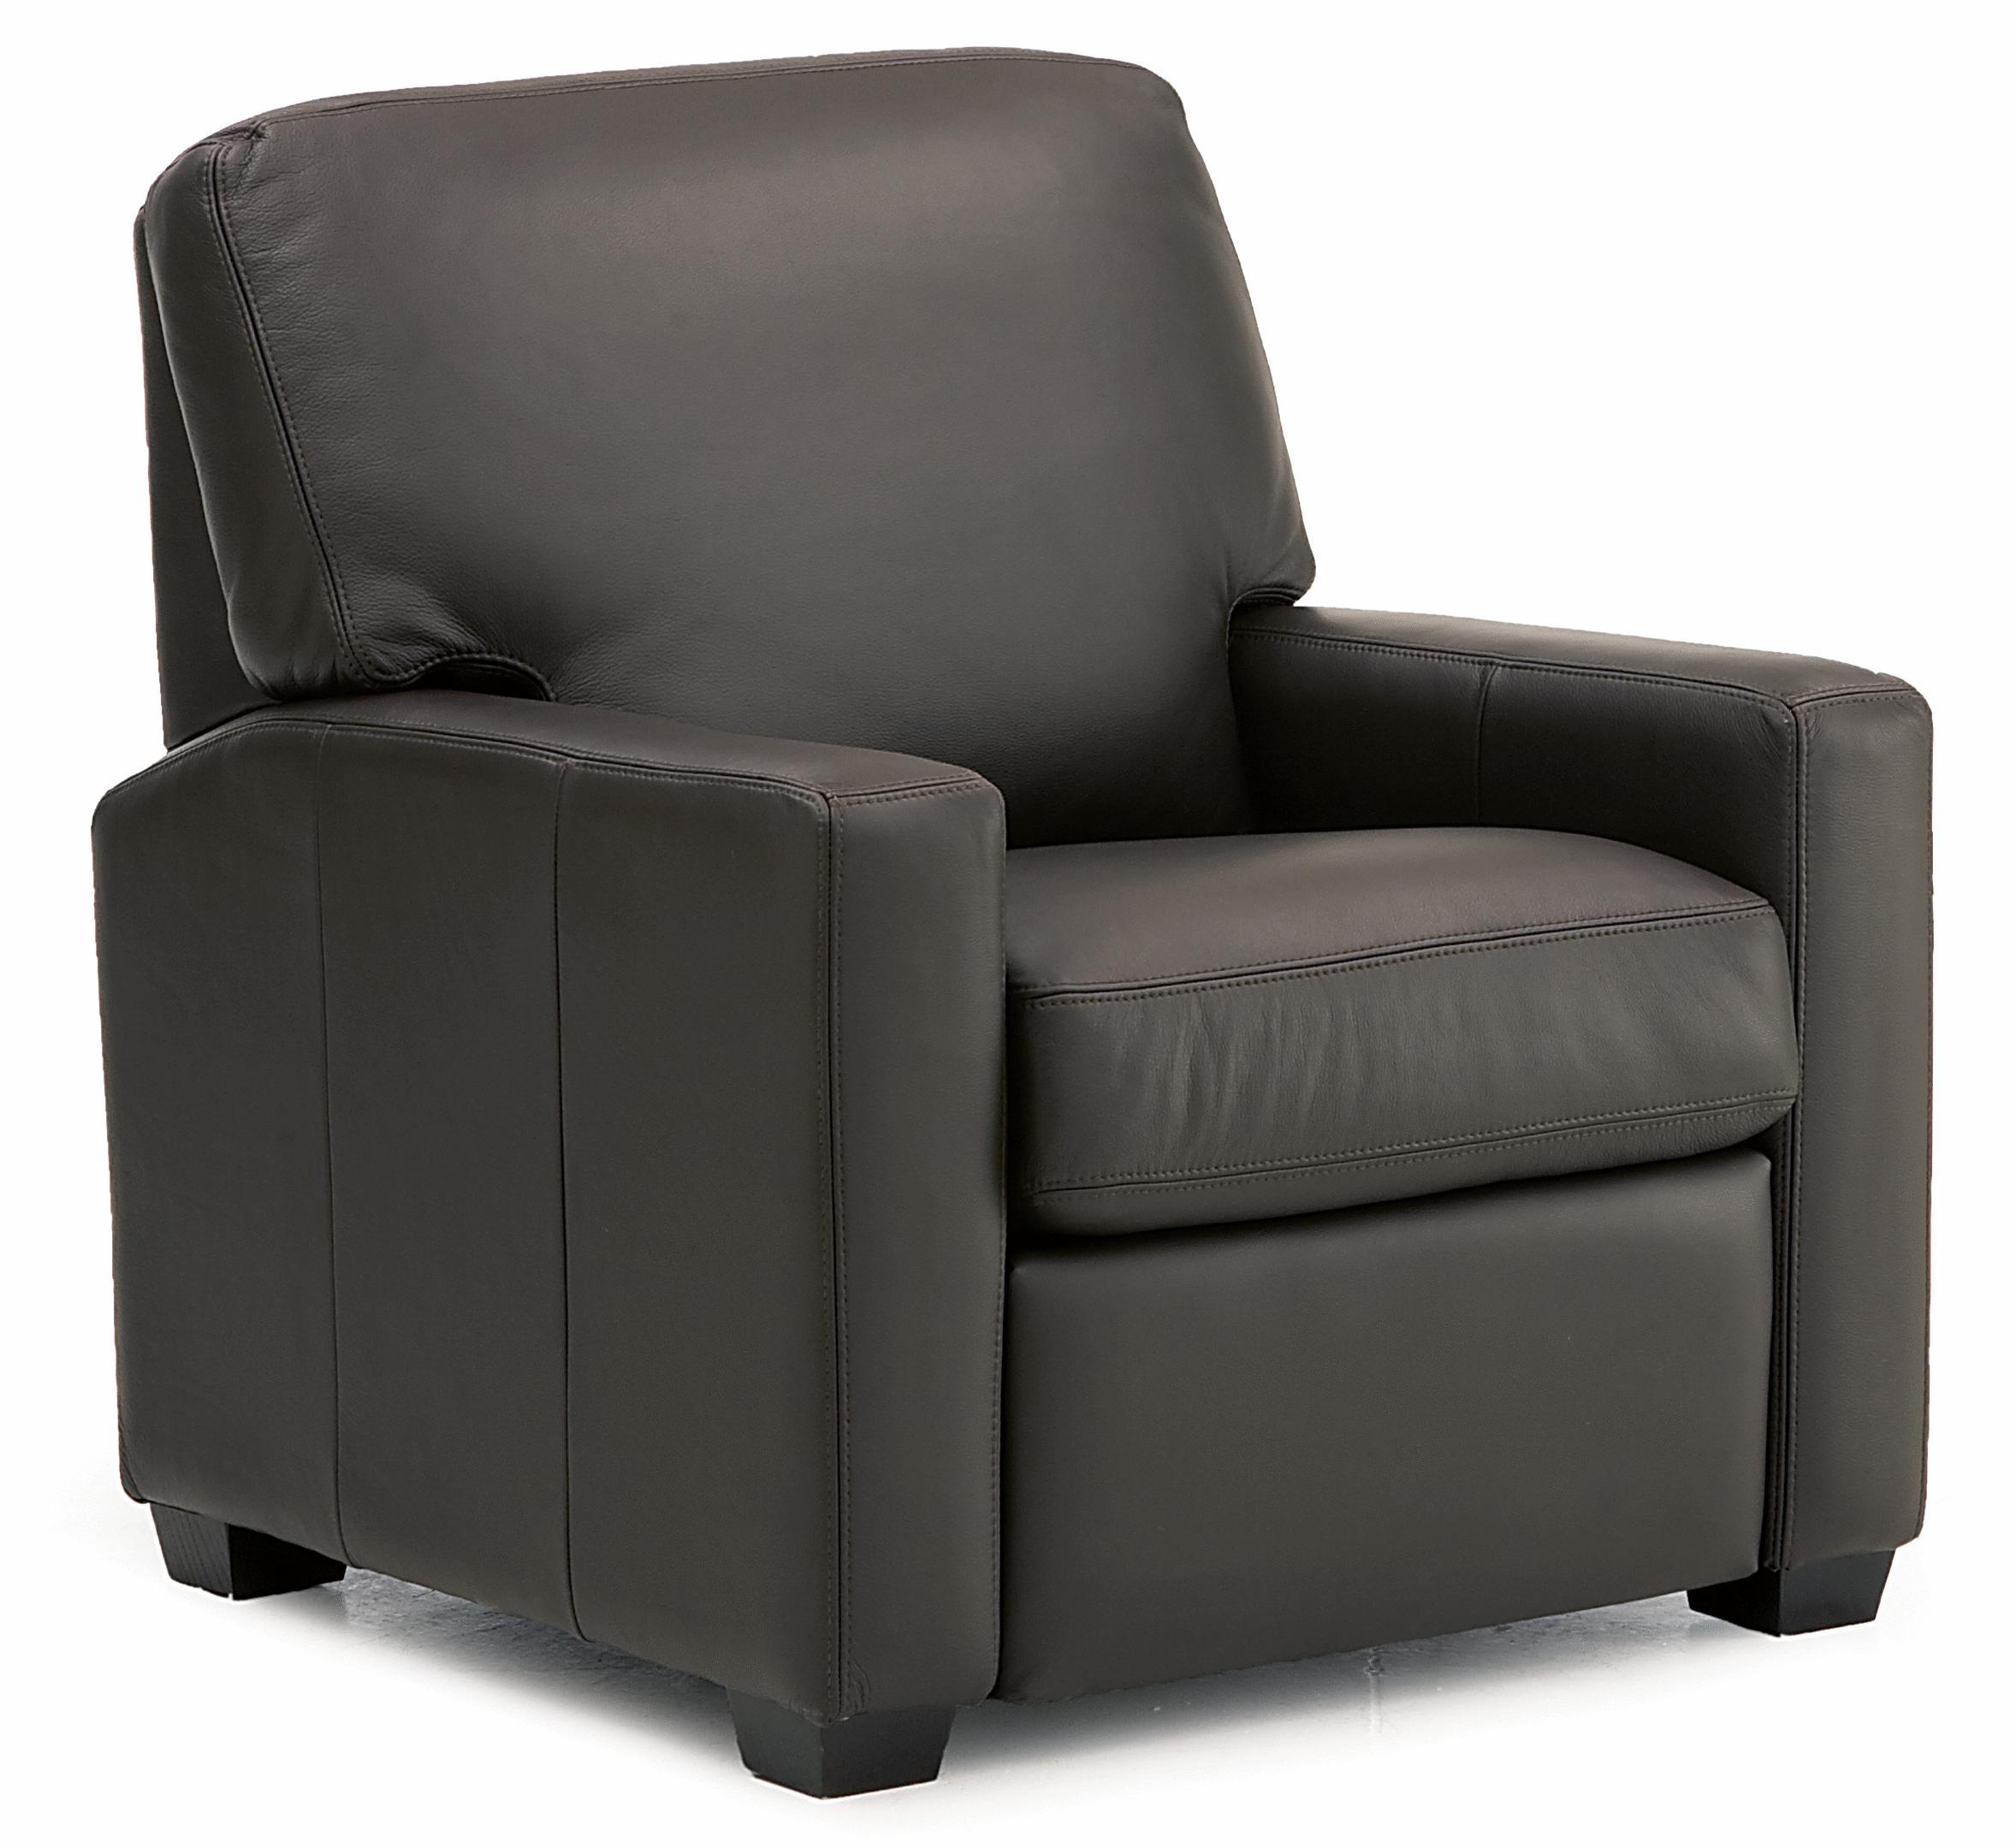 push back chair computer ball palliser westend contemporary pushback boulevard home furnishings high leg recliners